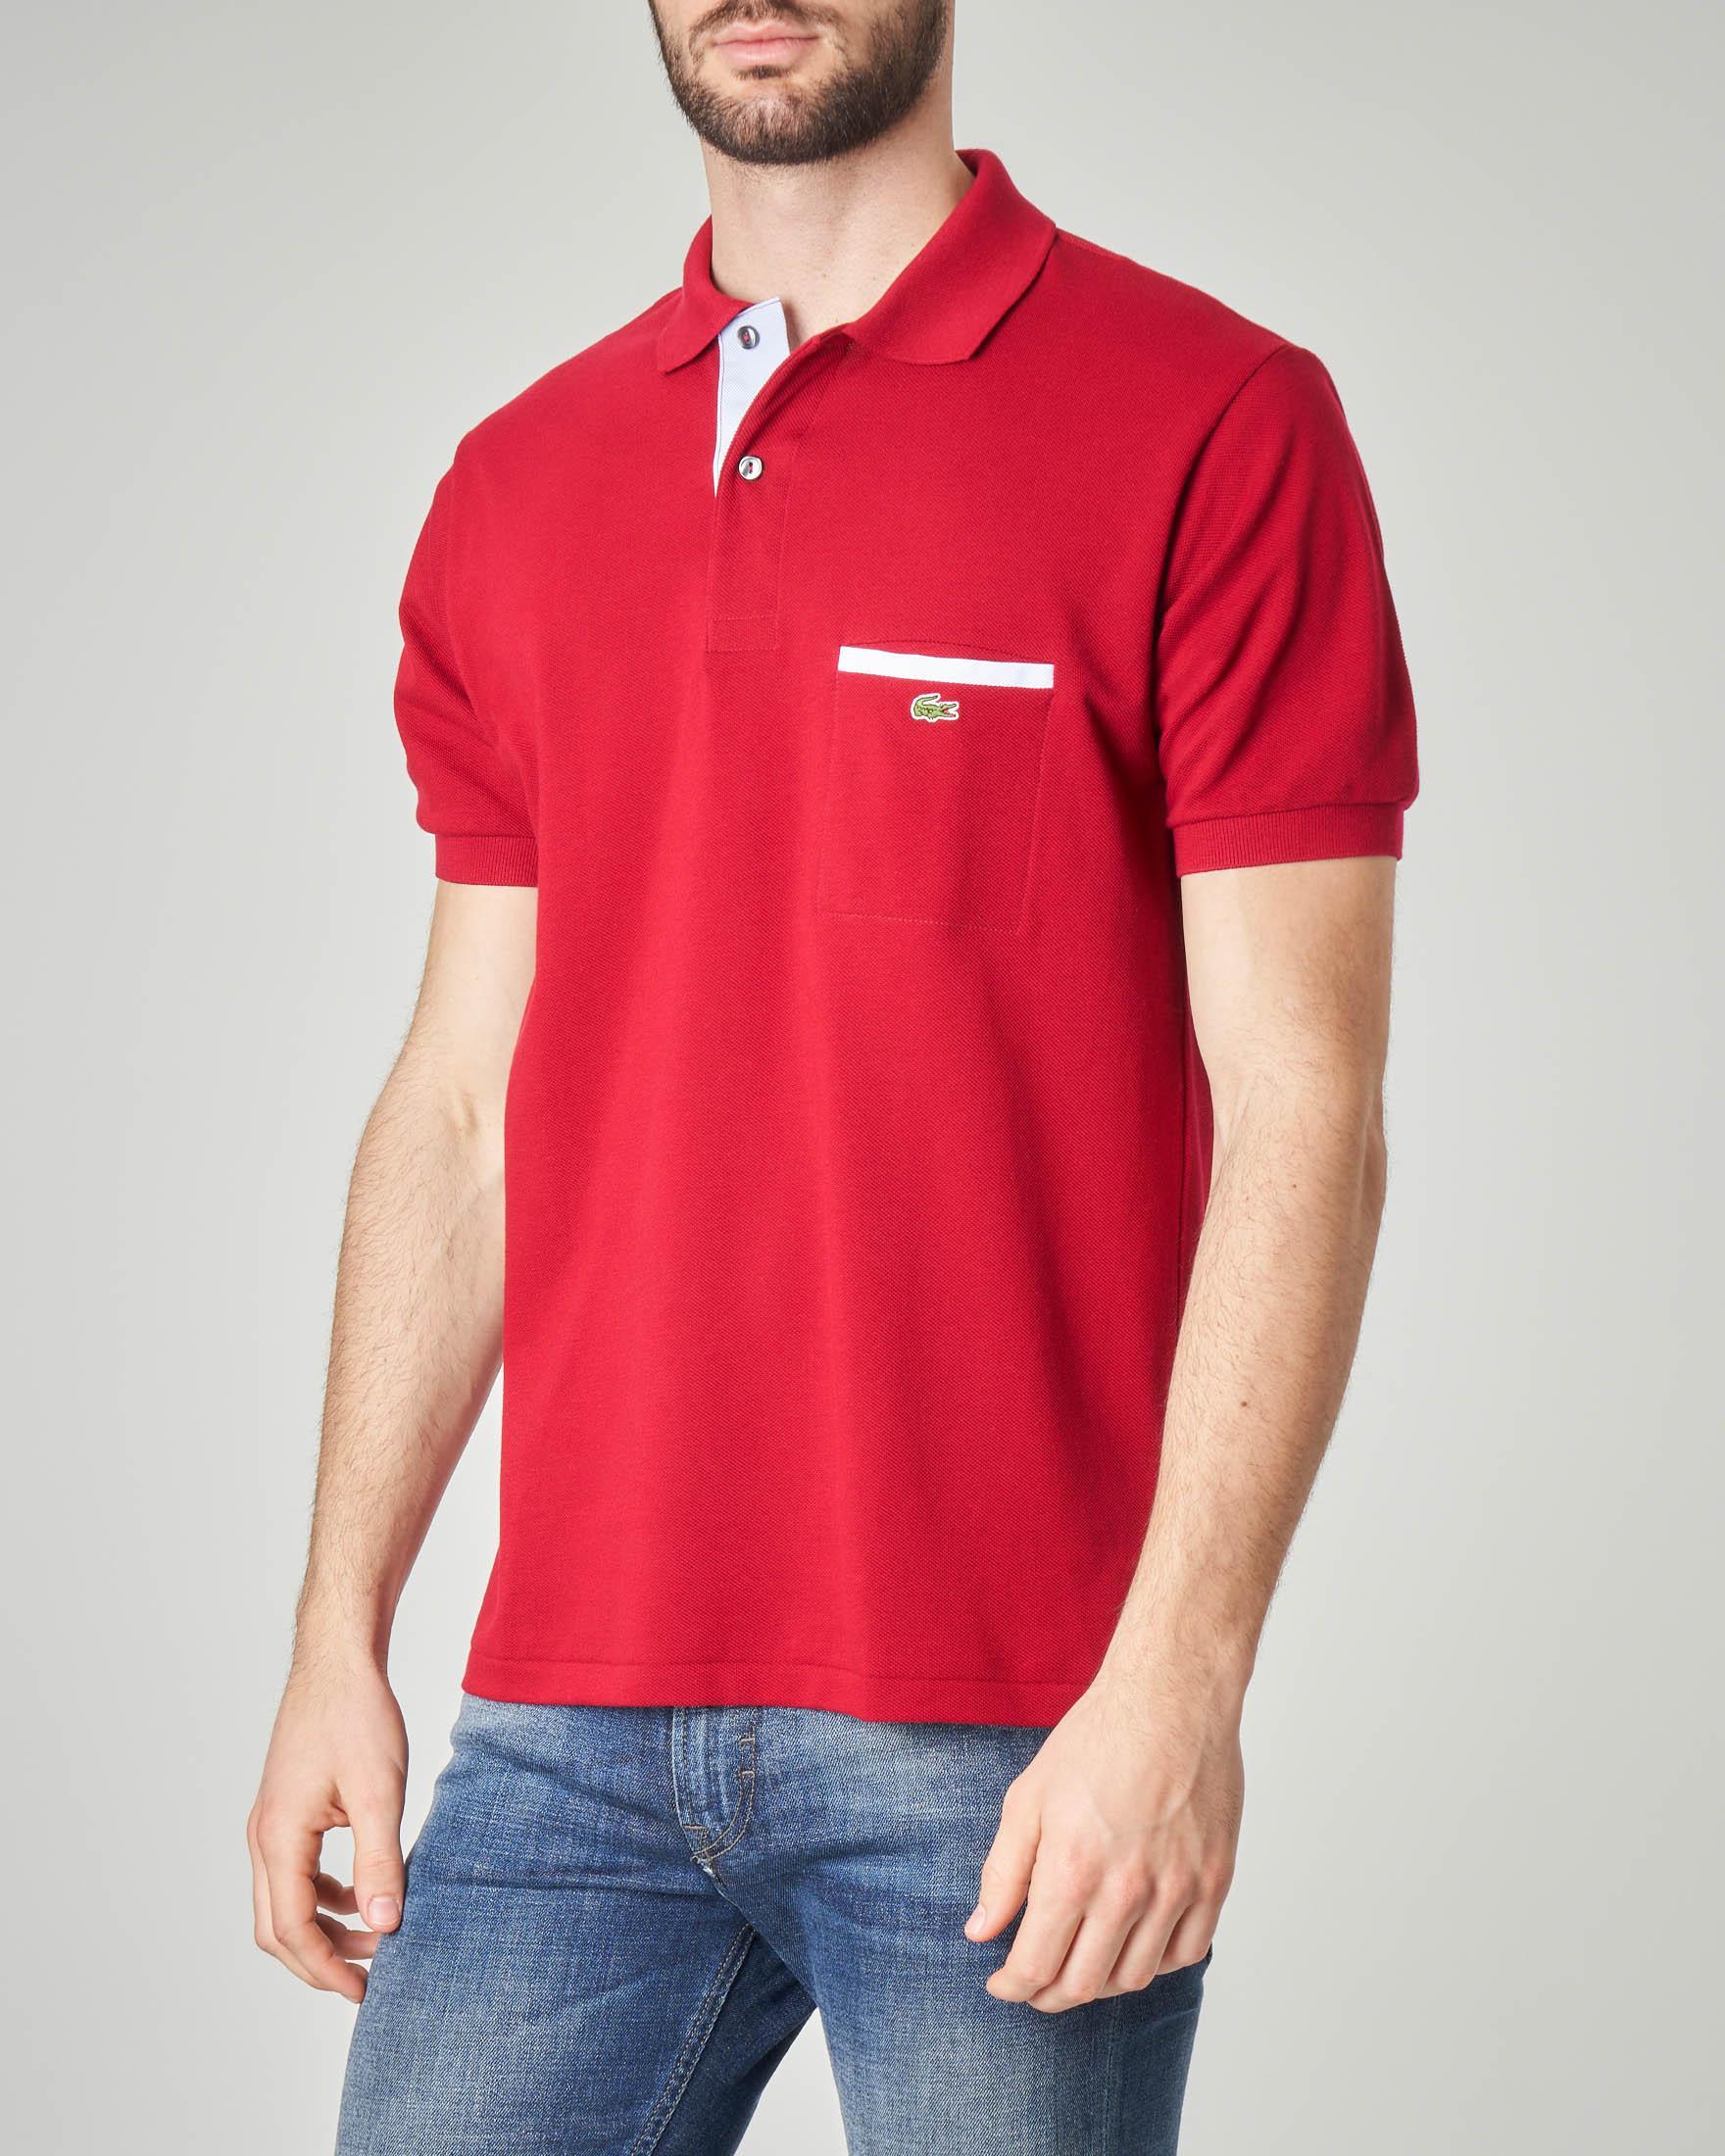 Polo rossa con taschino